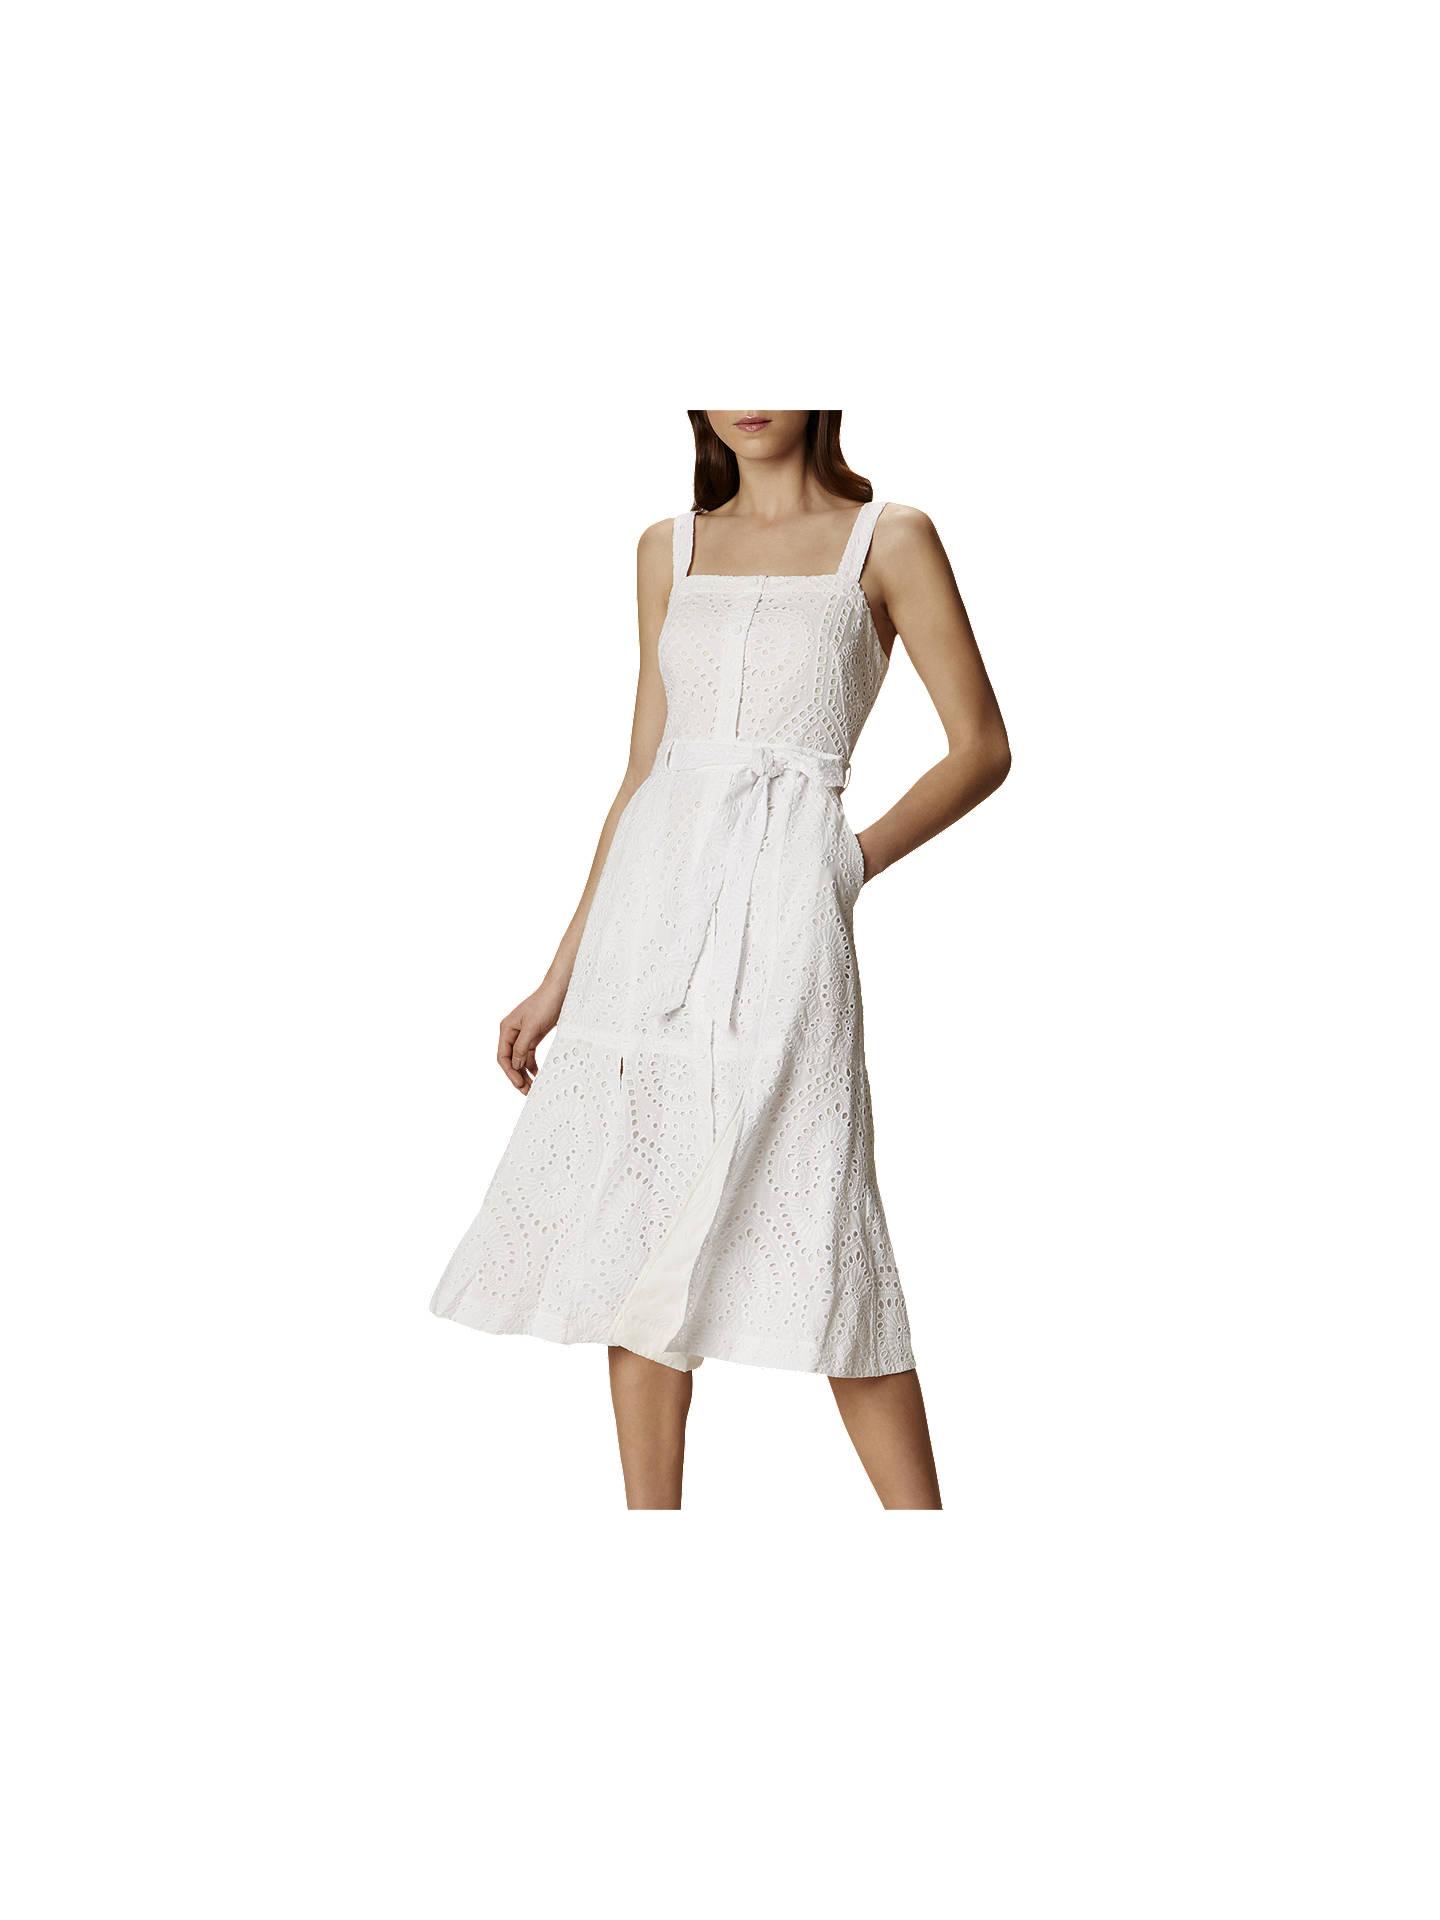 cc58a301f25 Buy Karen Millen Broderie Midi Dress